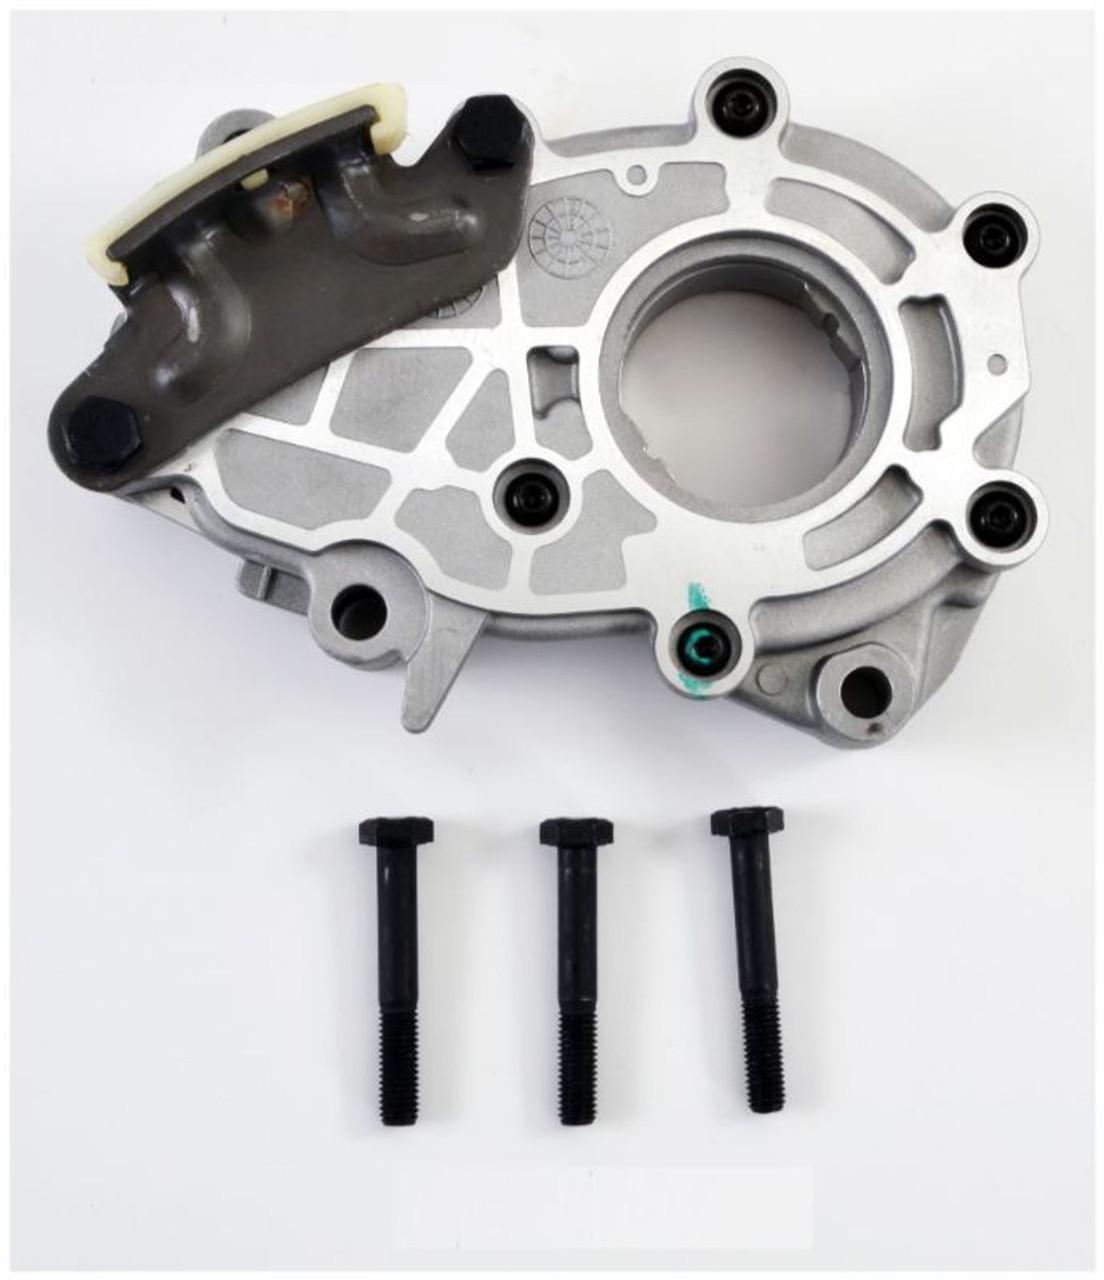 2012 Gmc Terrain 3 0l Engine Oil Pump Epk160 75